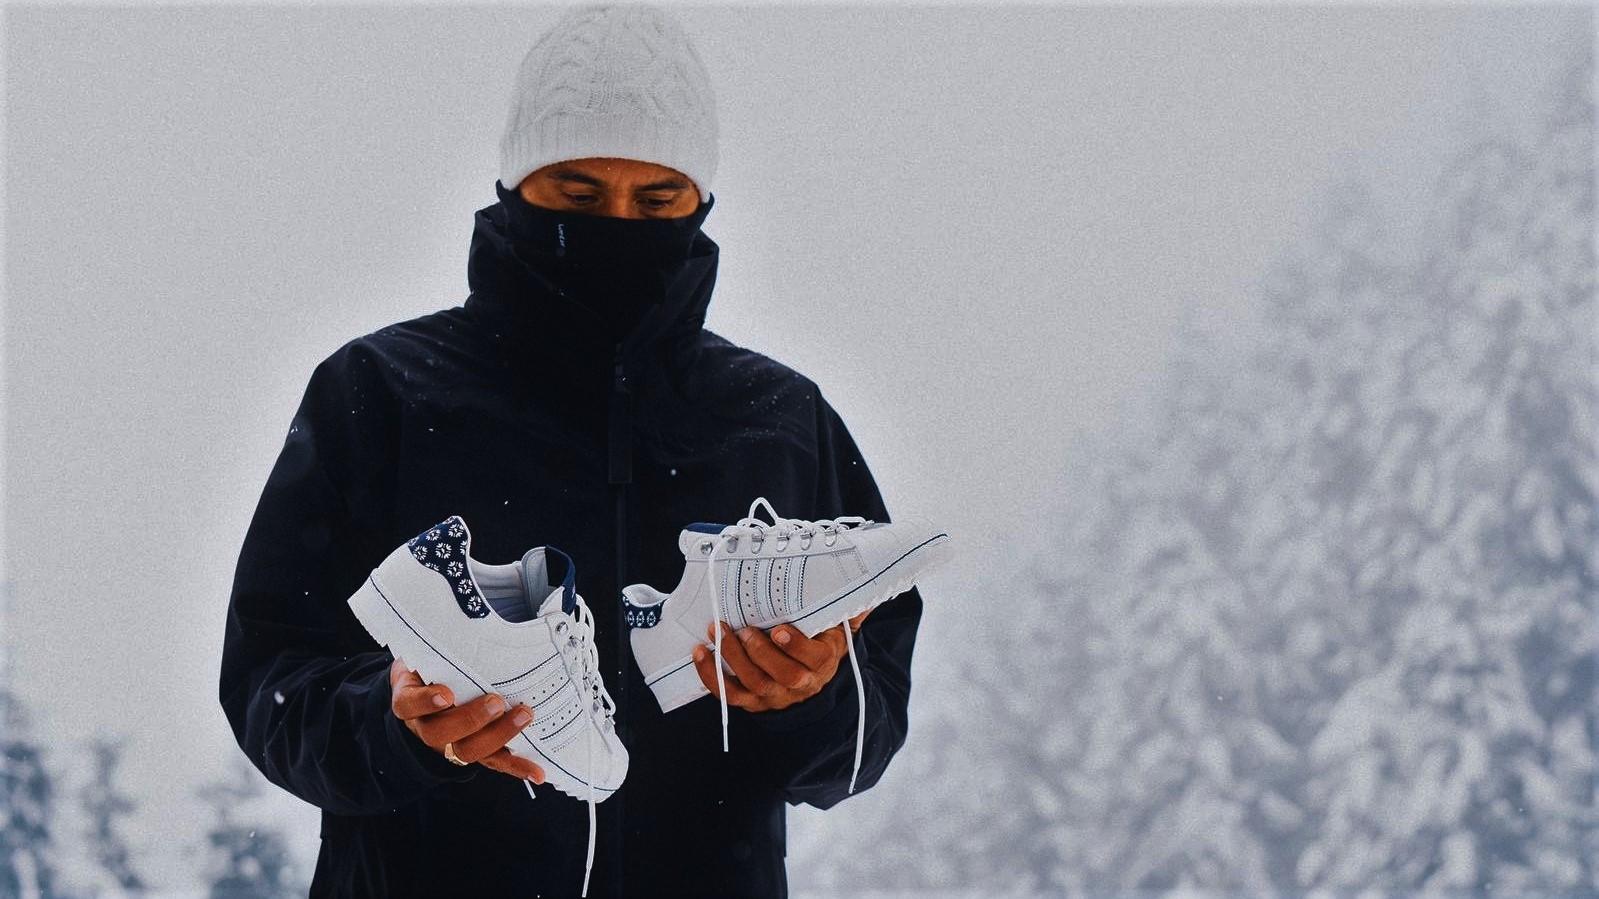 Editorial: Footshop x adidas Superstar 'Blueprinting' on the snow